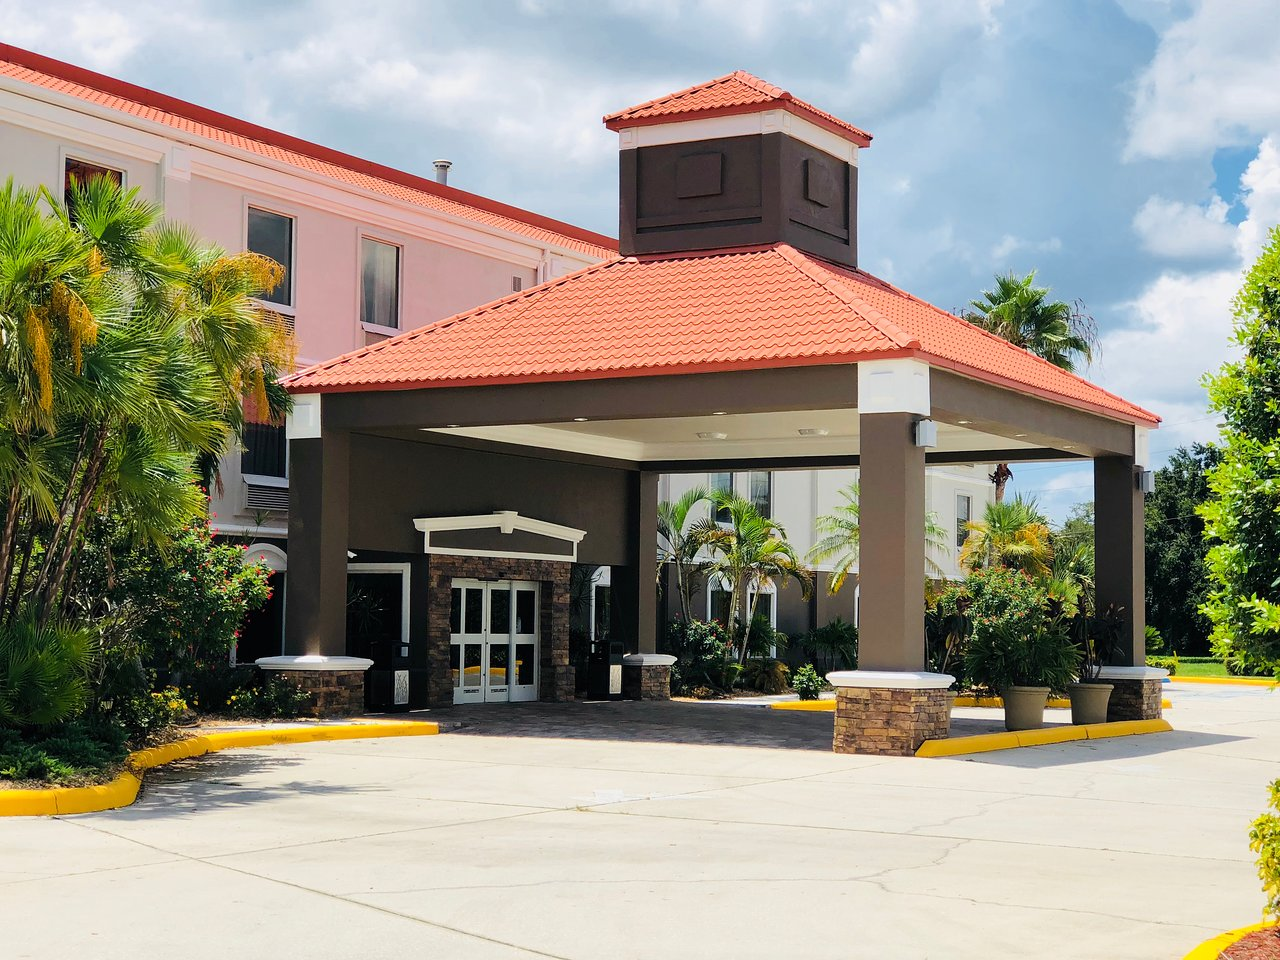 Best Western Plus Bradenton Hotel Suites 81 165 Updated